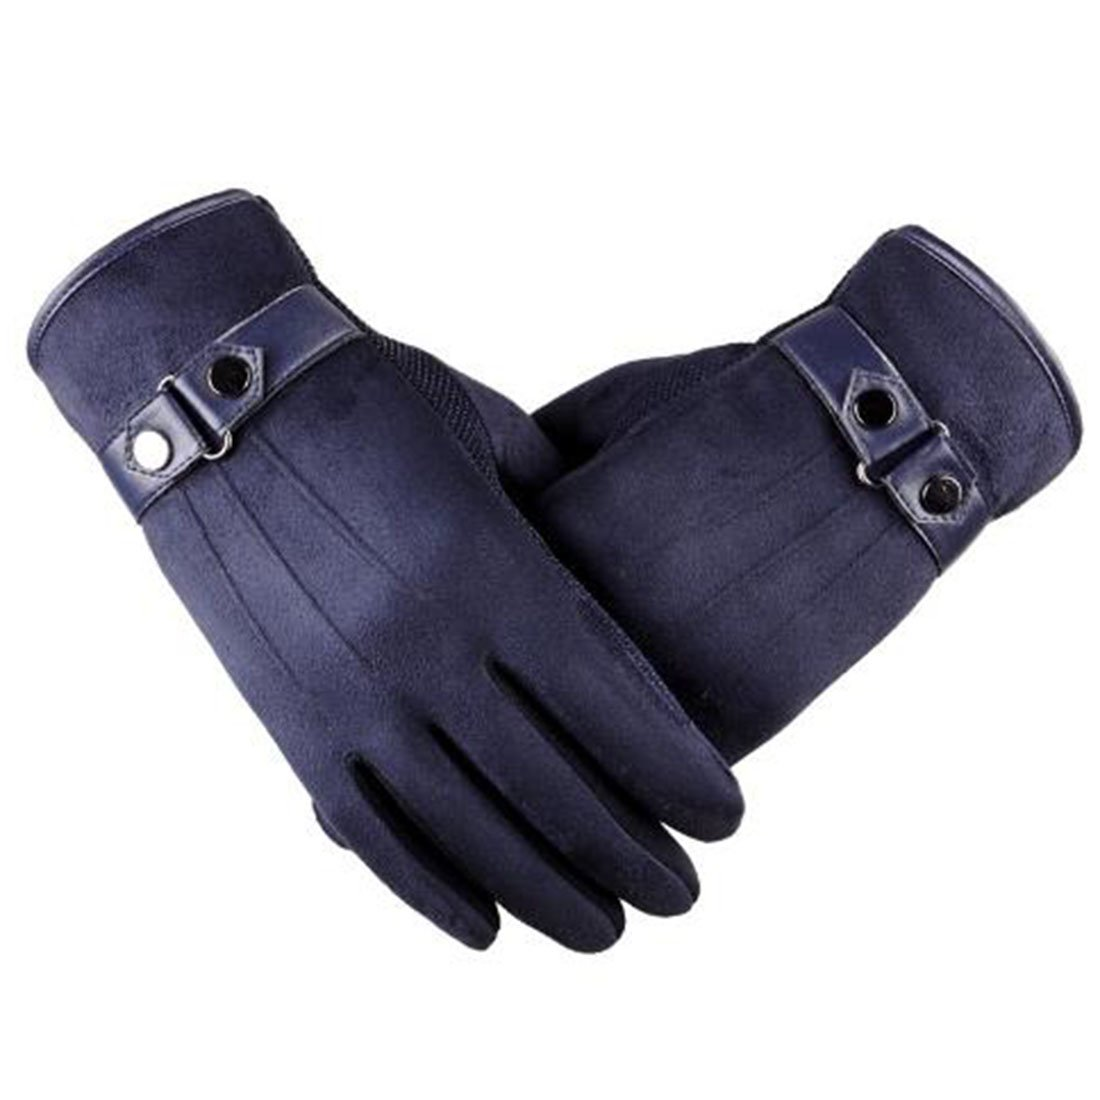 Little Chair Mens Touch Screen Winter Warm Gloves Cycling Windproof Mitten Gift (Blue)